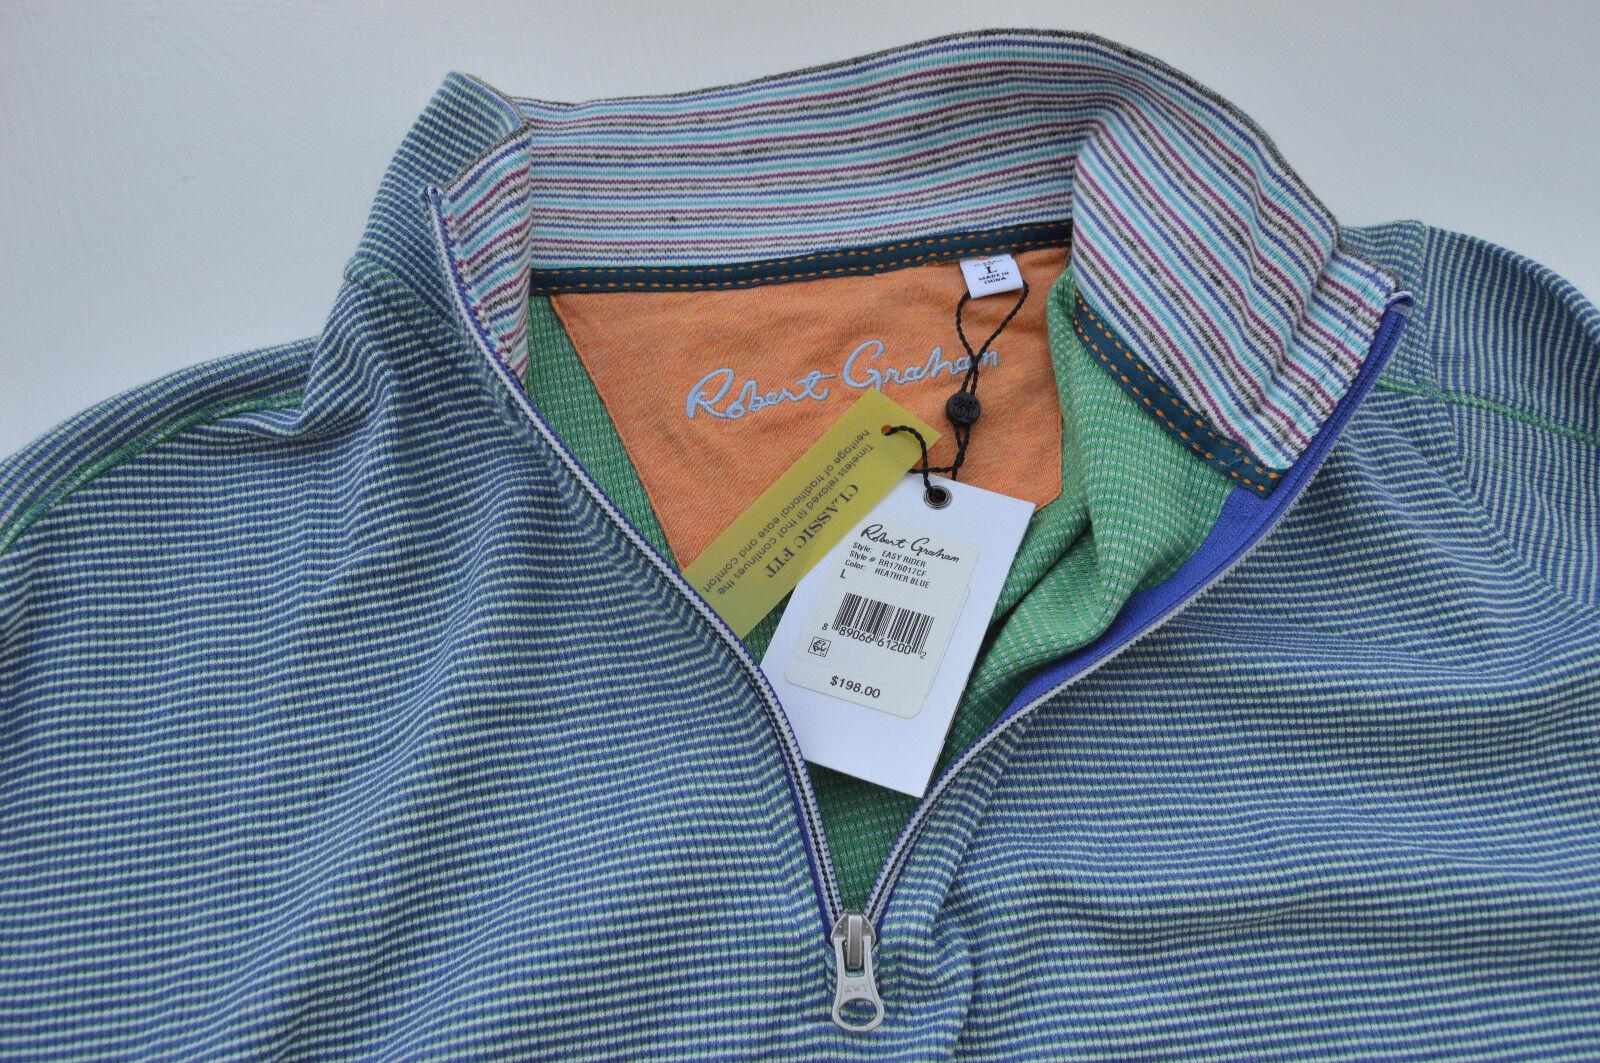 NWT  Robert Graham Mens EASY RIDER long sleeve HALF-ZIP sweater shirt size L